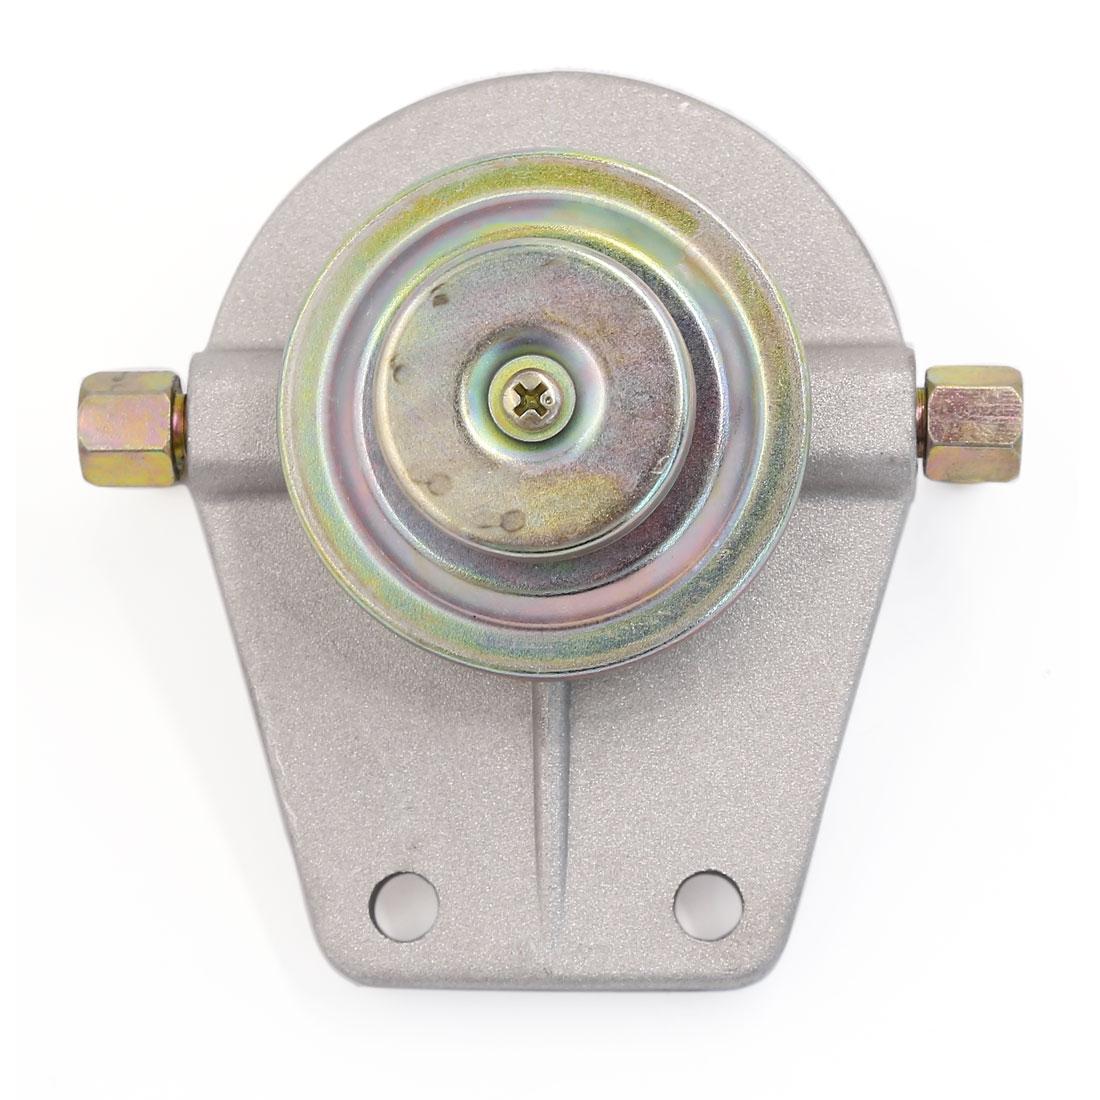 Metal Submersible Transfer Pump Water Oil Fuel Fluids Separator for WL034